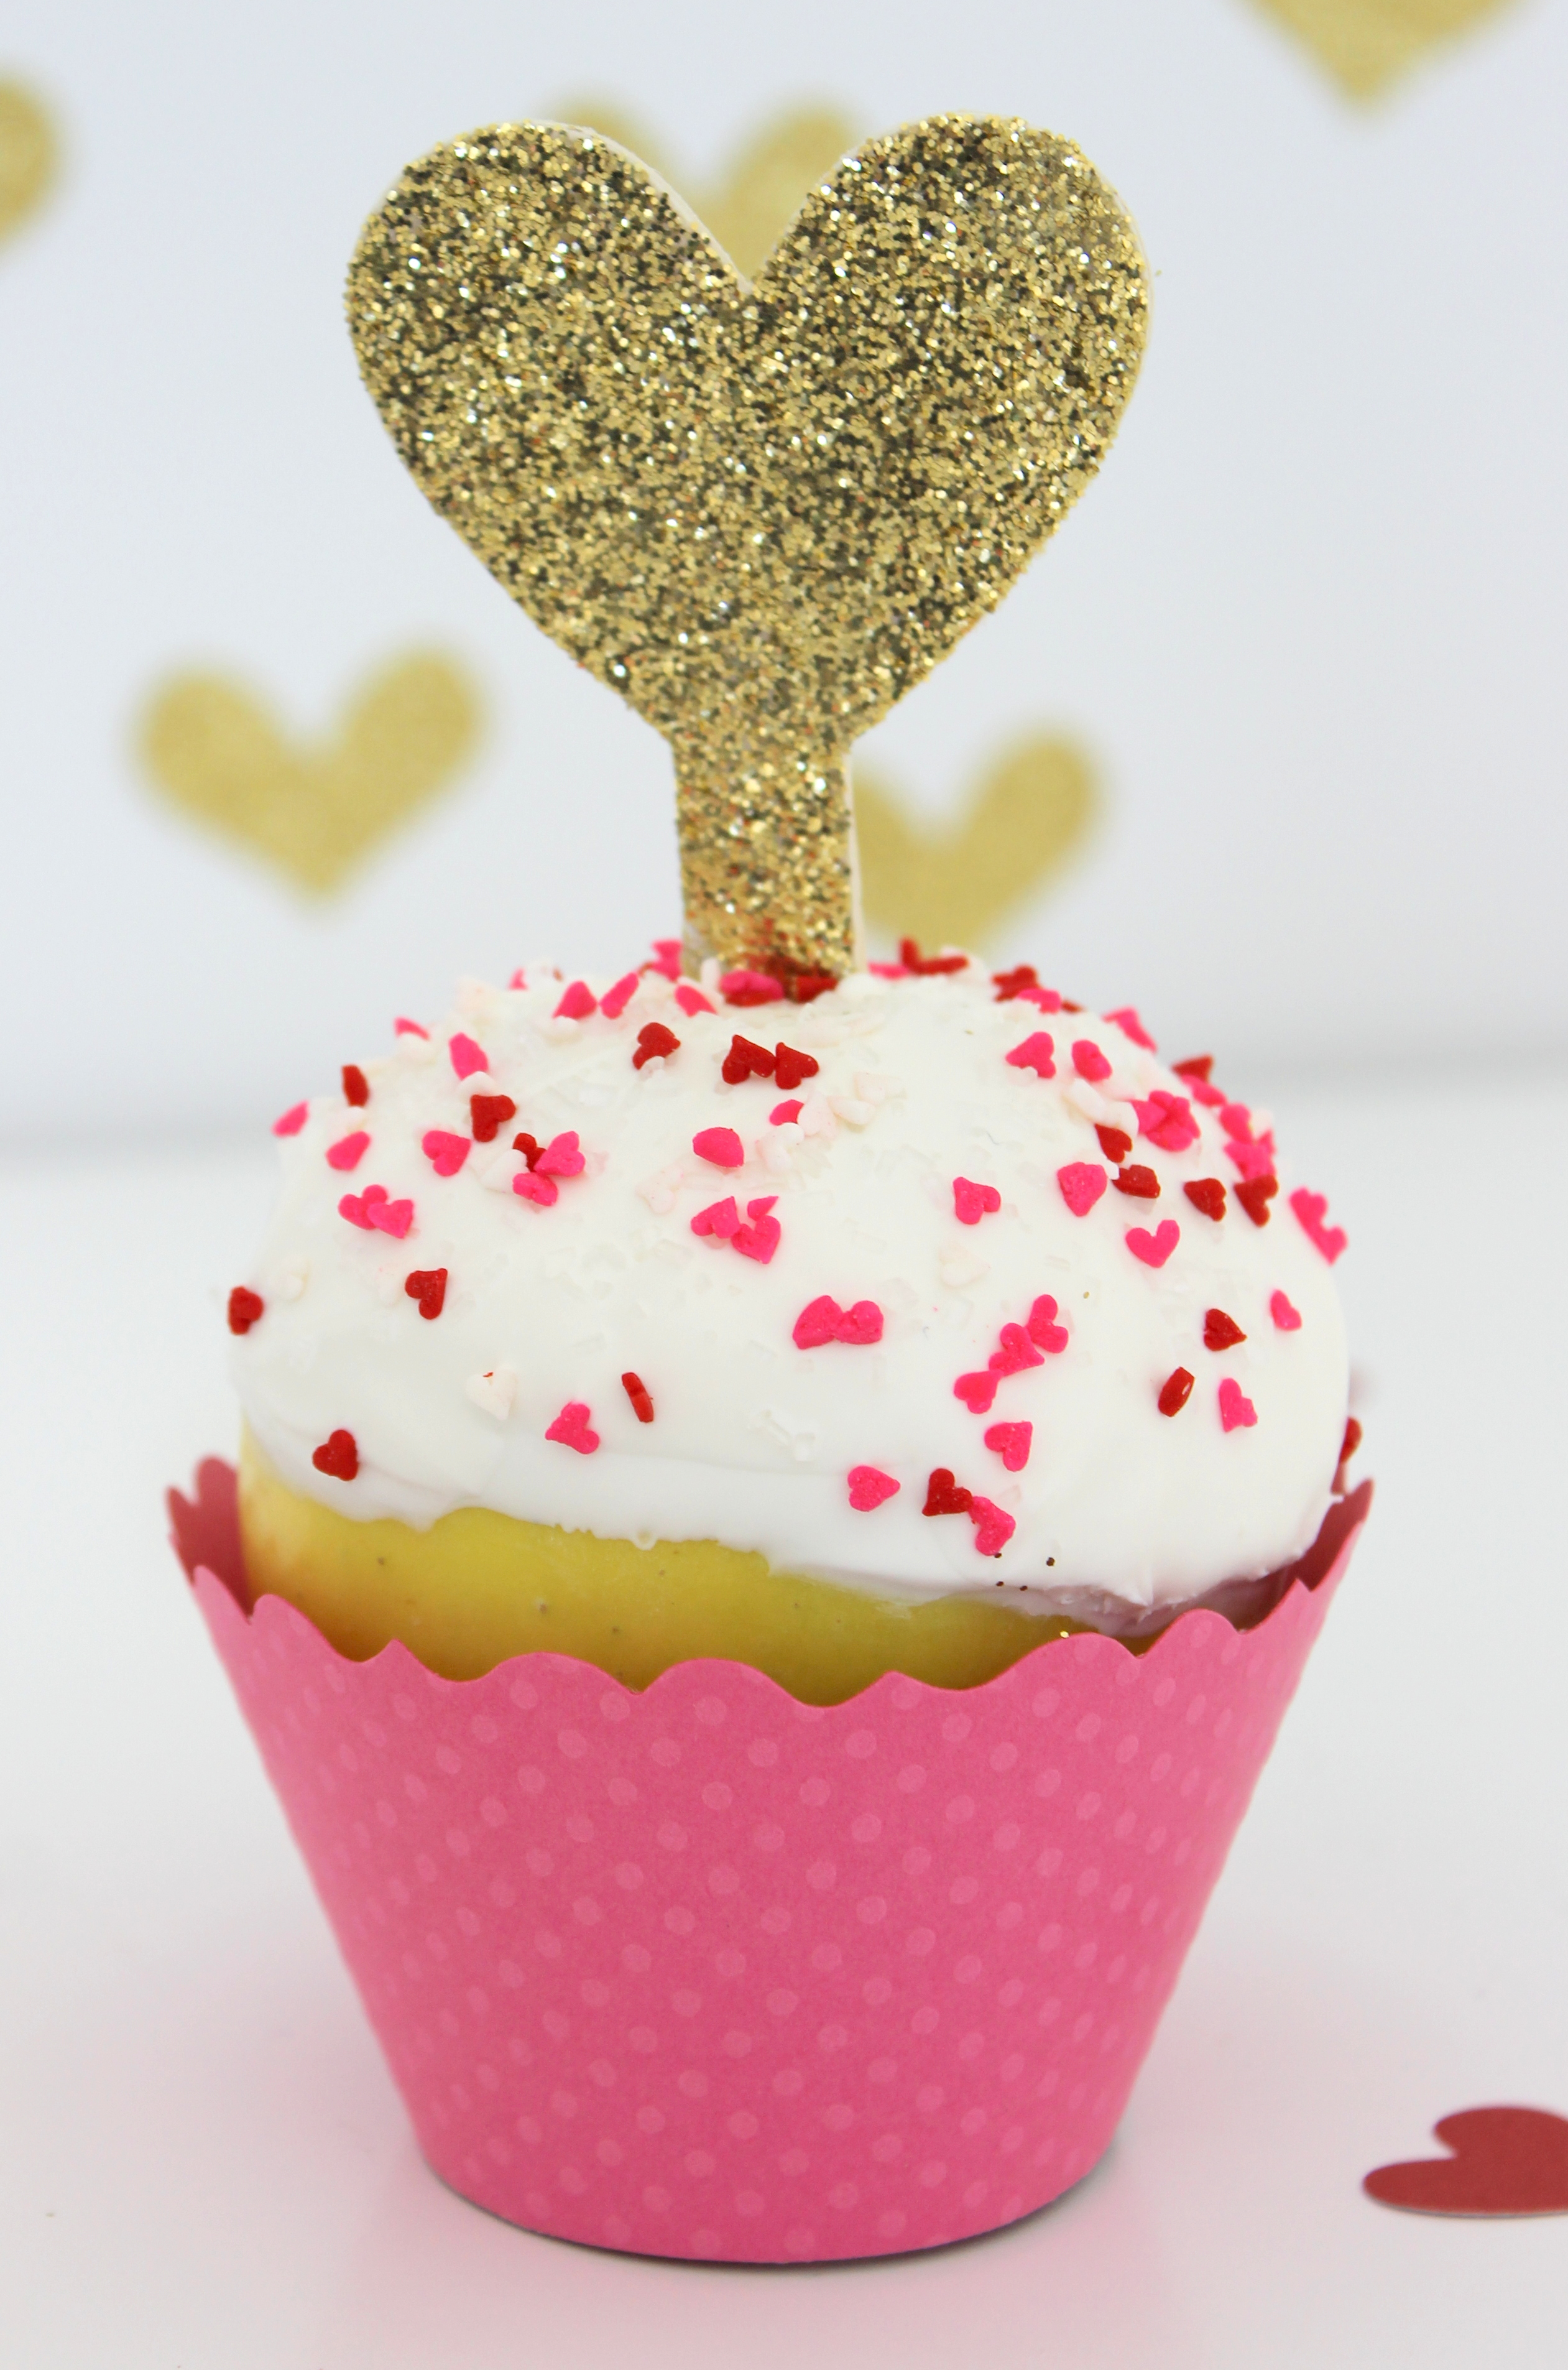 DIY Valentine's Day Apple in Cupcake Wrapper